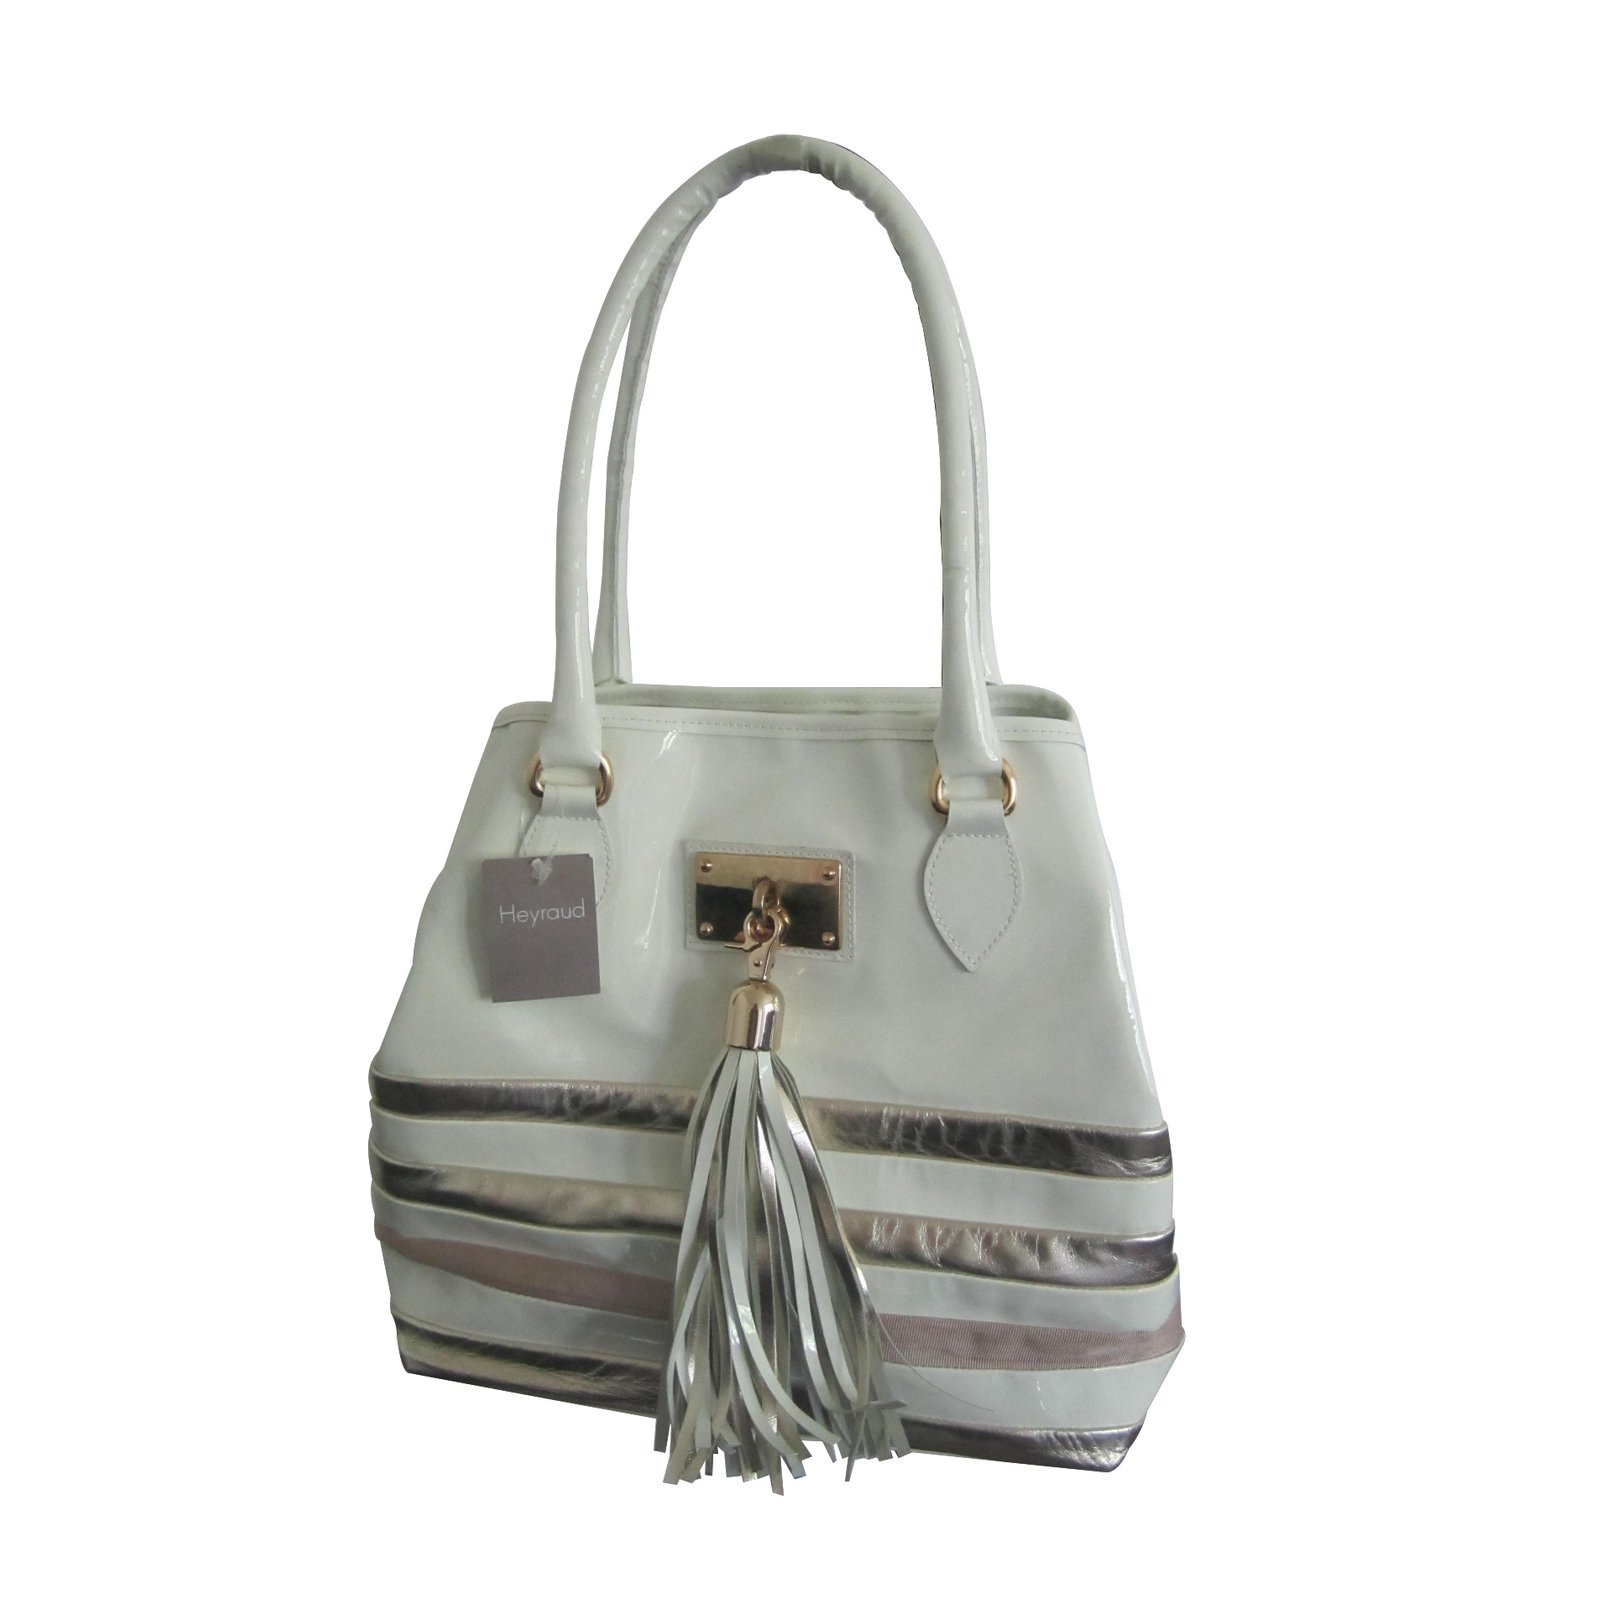 sacs main autre marque sac main heyraud cuir vernis blanc joli closet. Black Bedroom Furniture Sets. Home Design Ideas